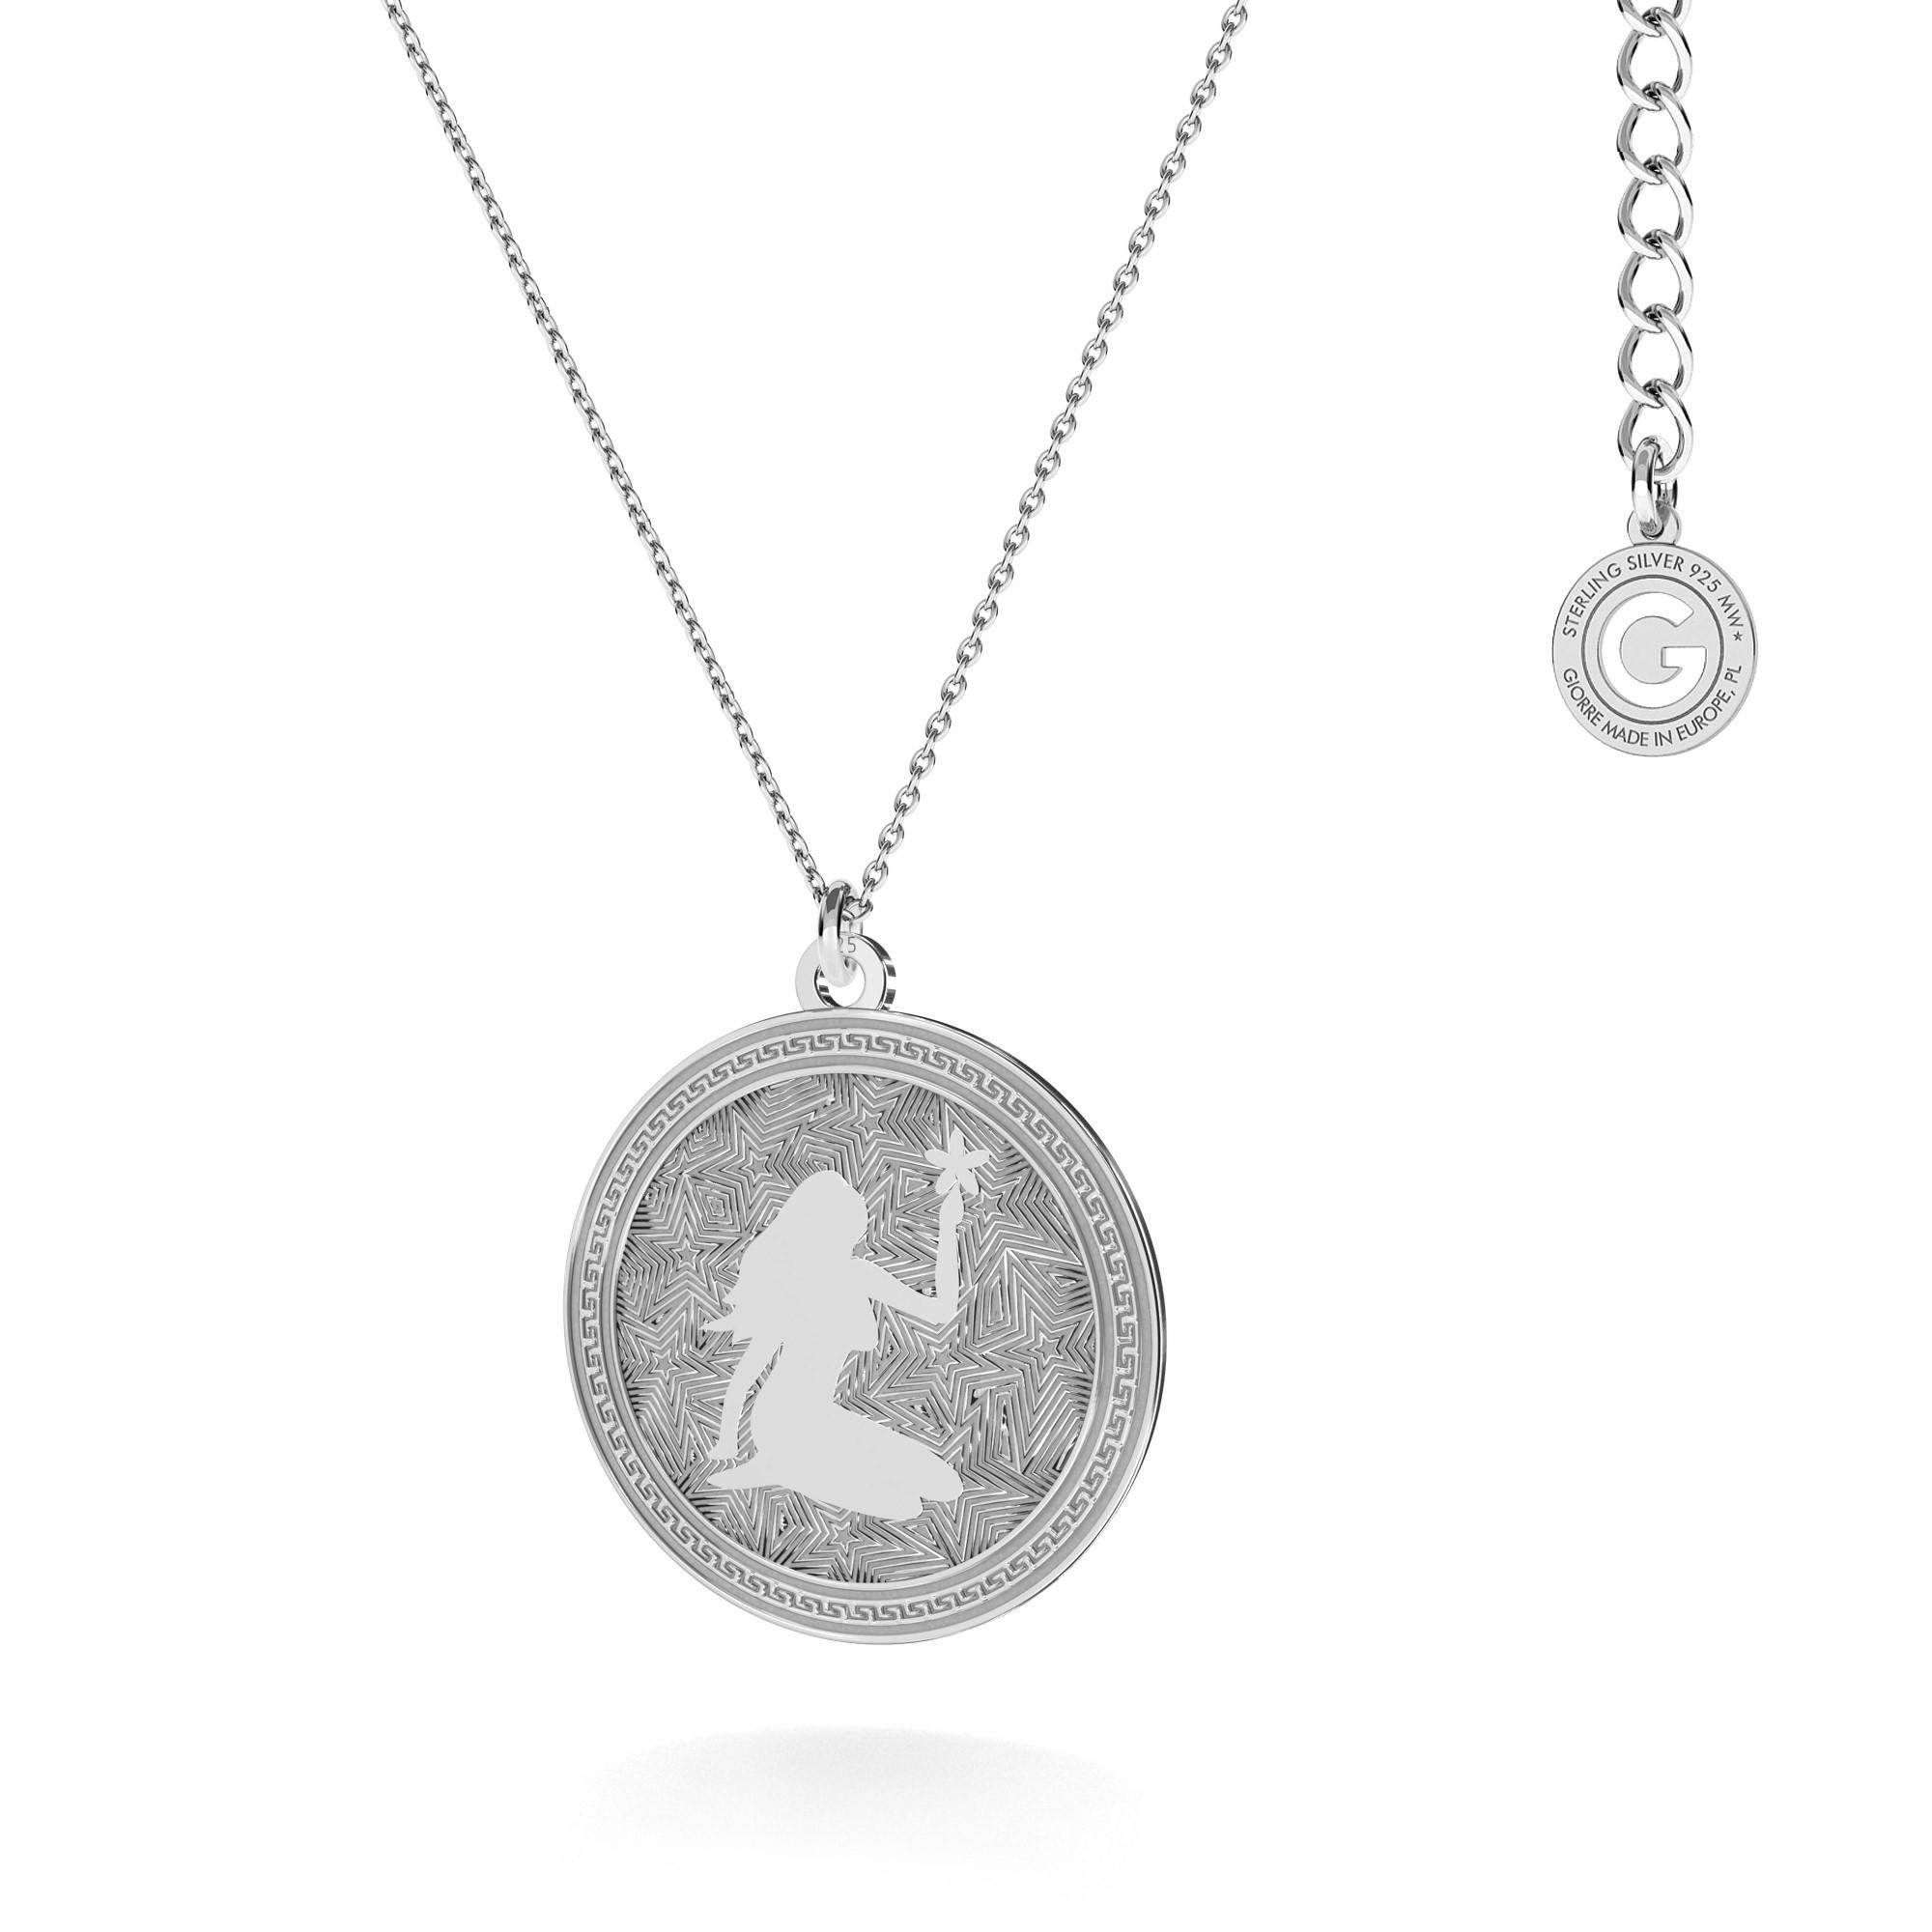 LION zodiac sign necklace silver 925